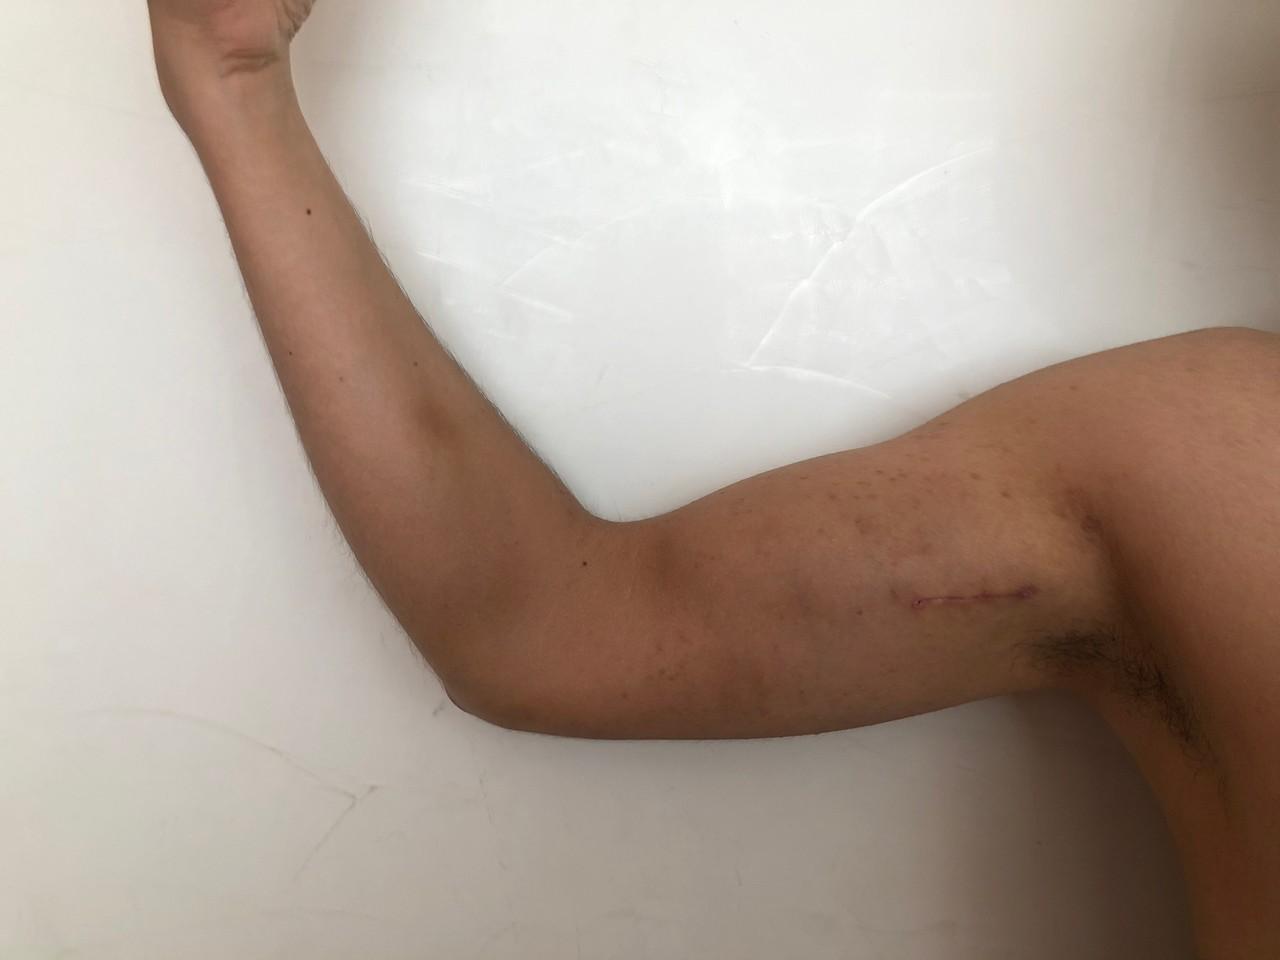 implante-biceps-4